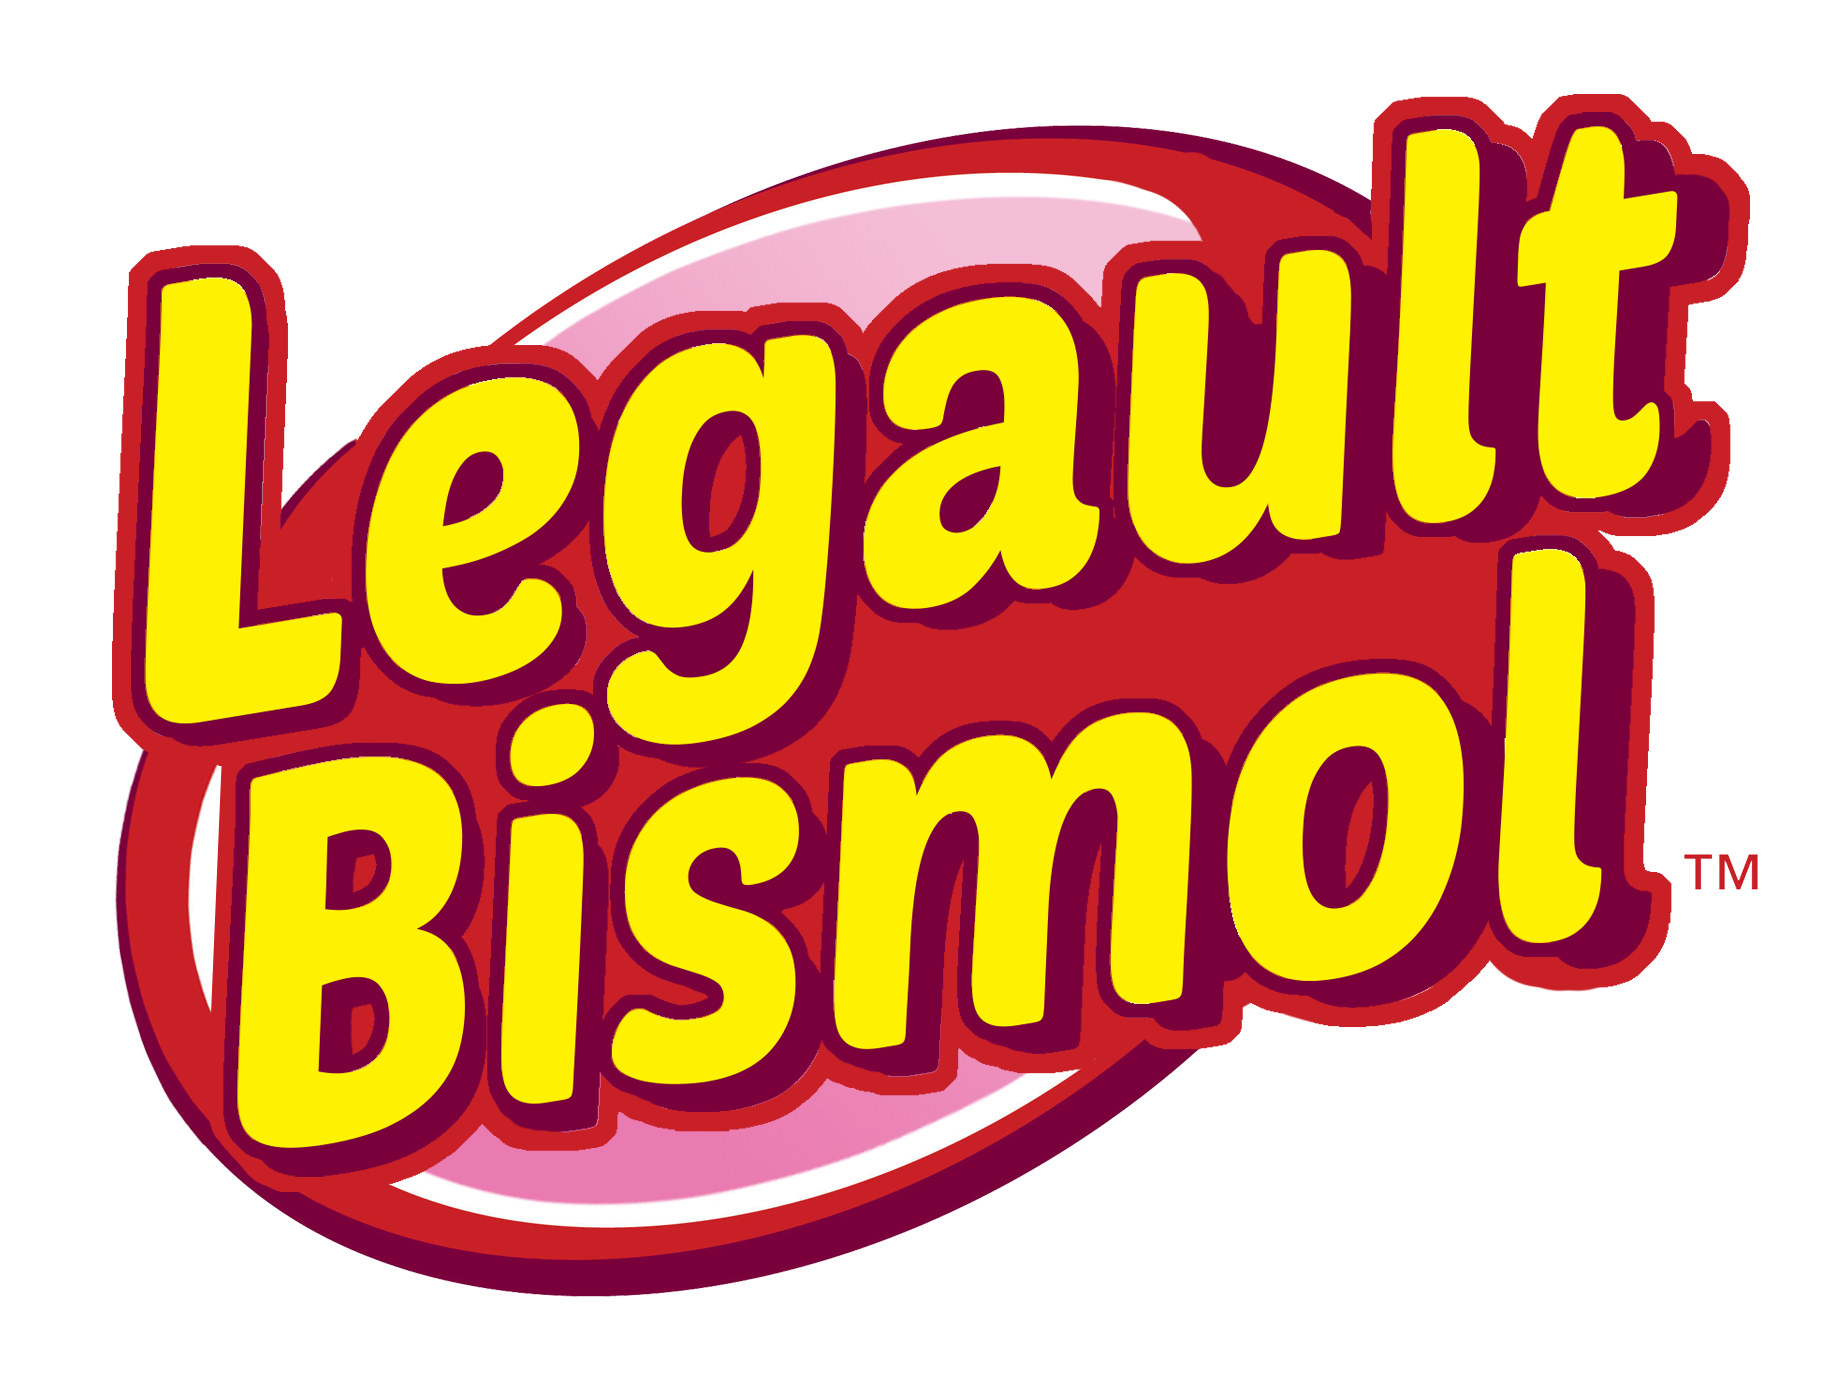 Legault Bismol logo aprilus